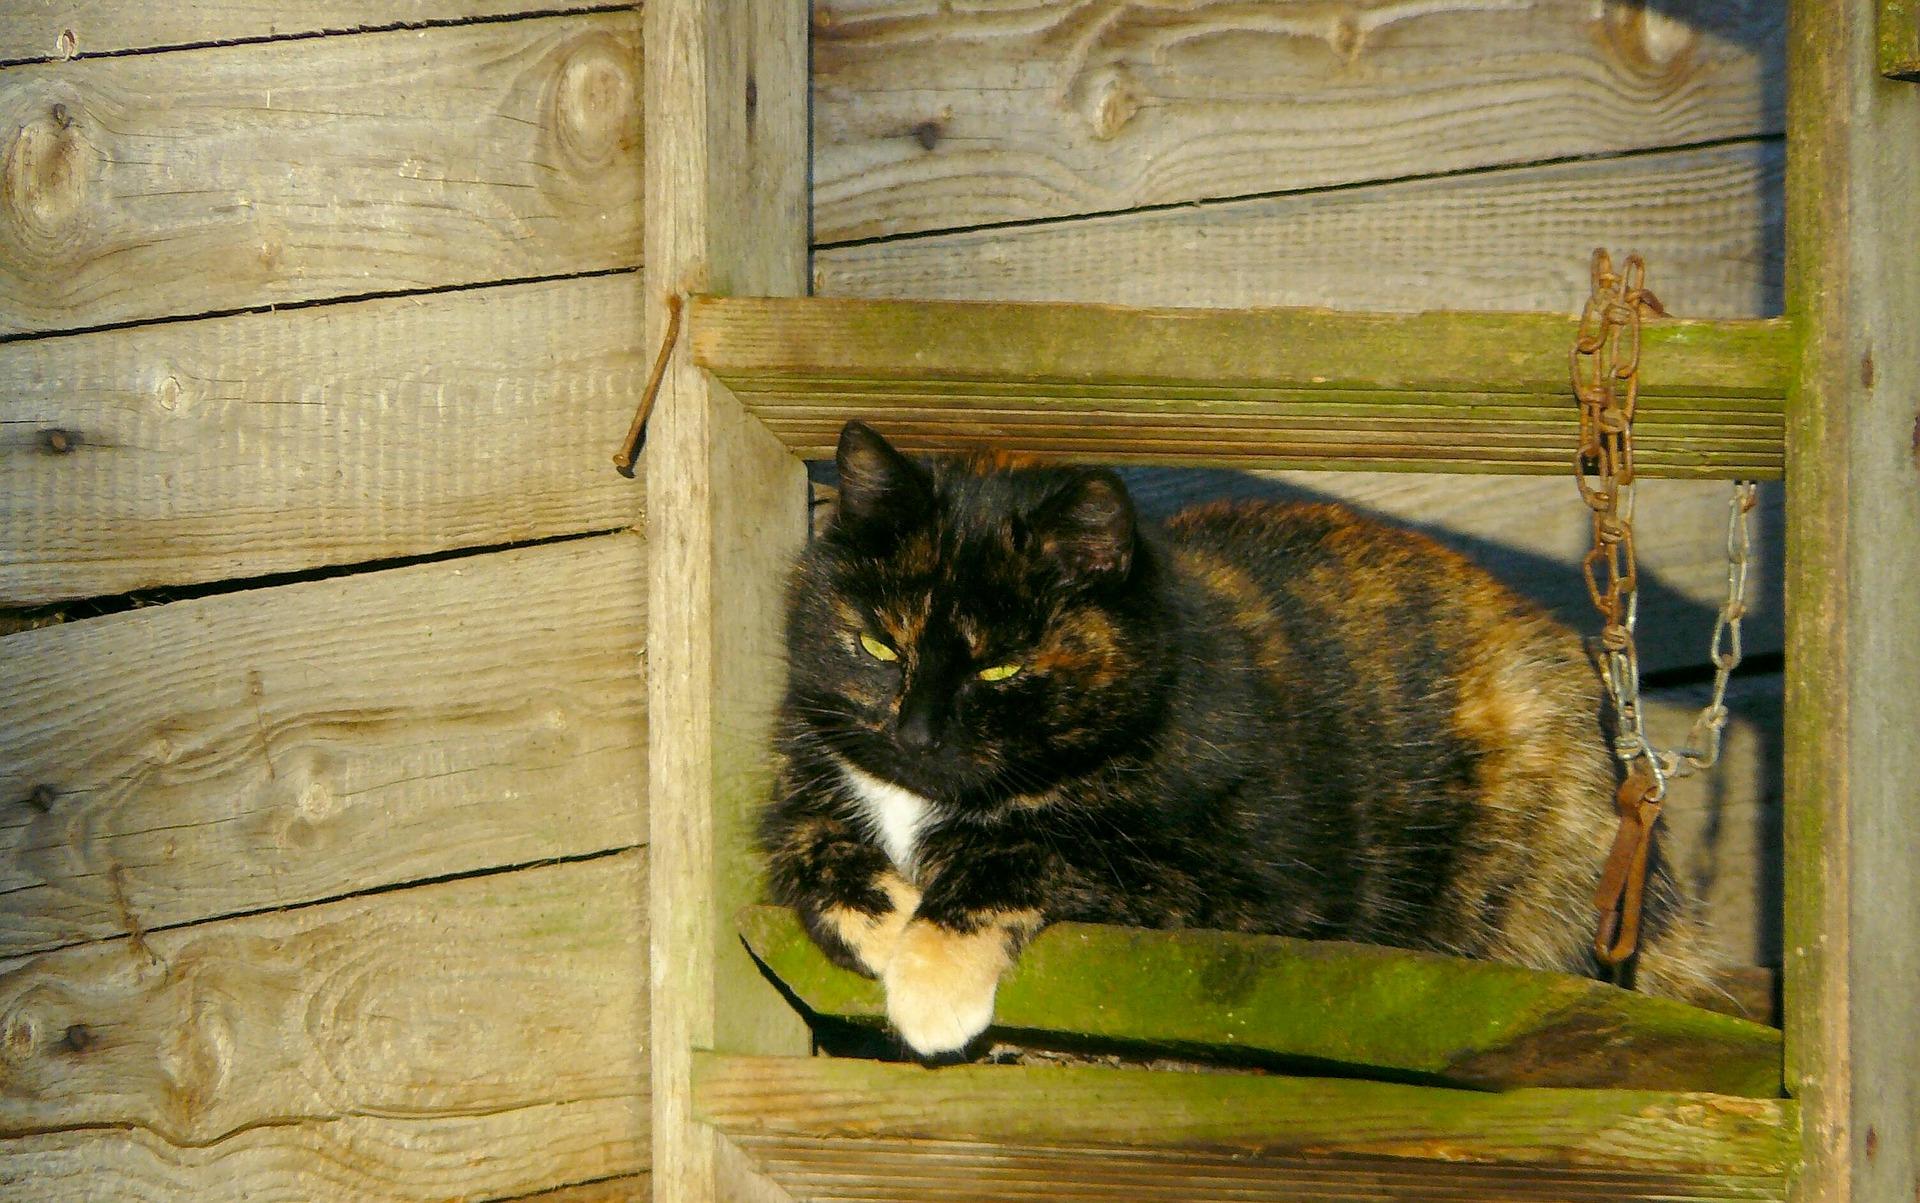 los gatos mayores suelen padecer hipertiroidismo